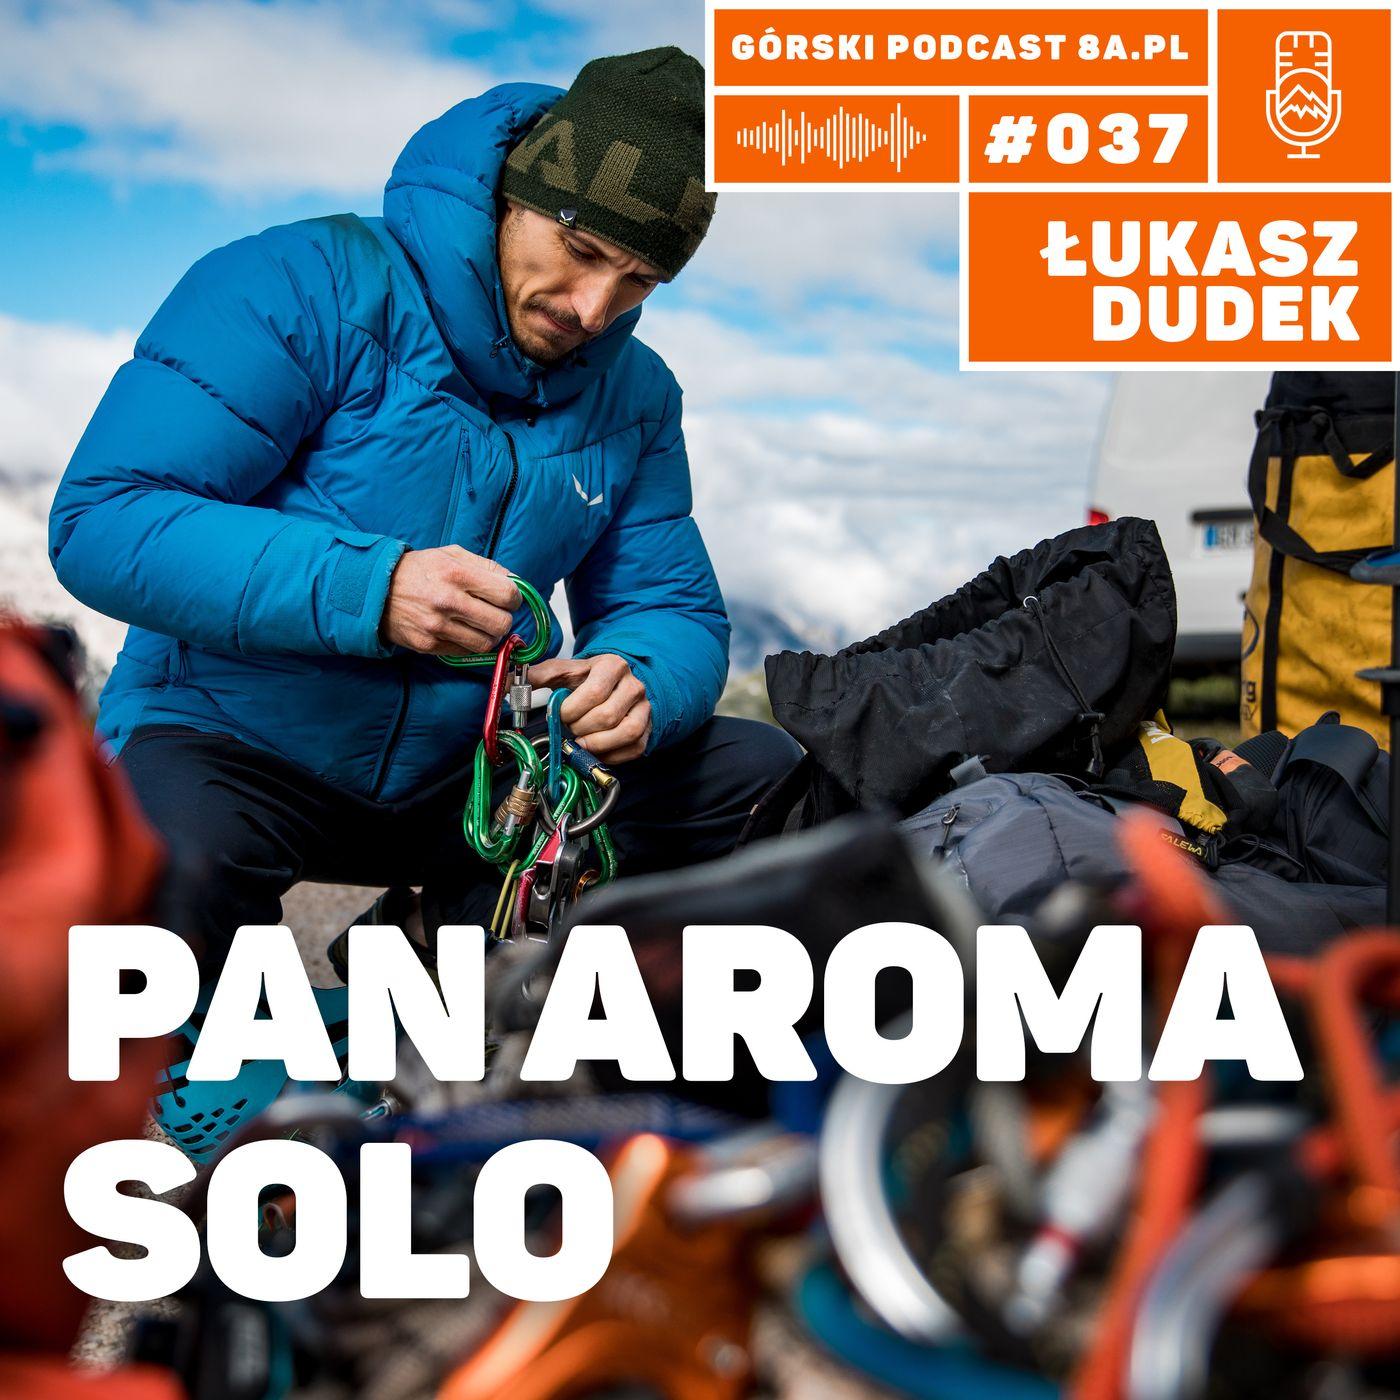 #037 8a.pl - Łukasz Dudek. Pan Aroma solo.